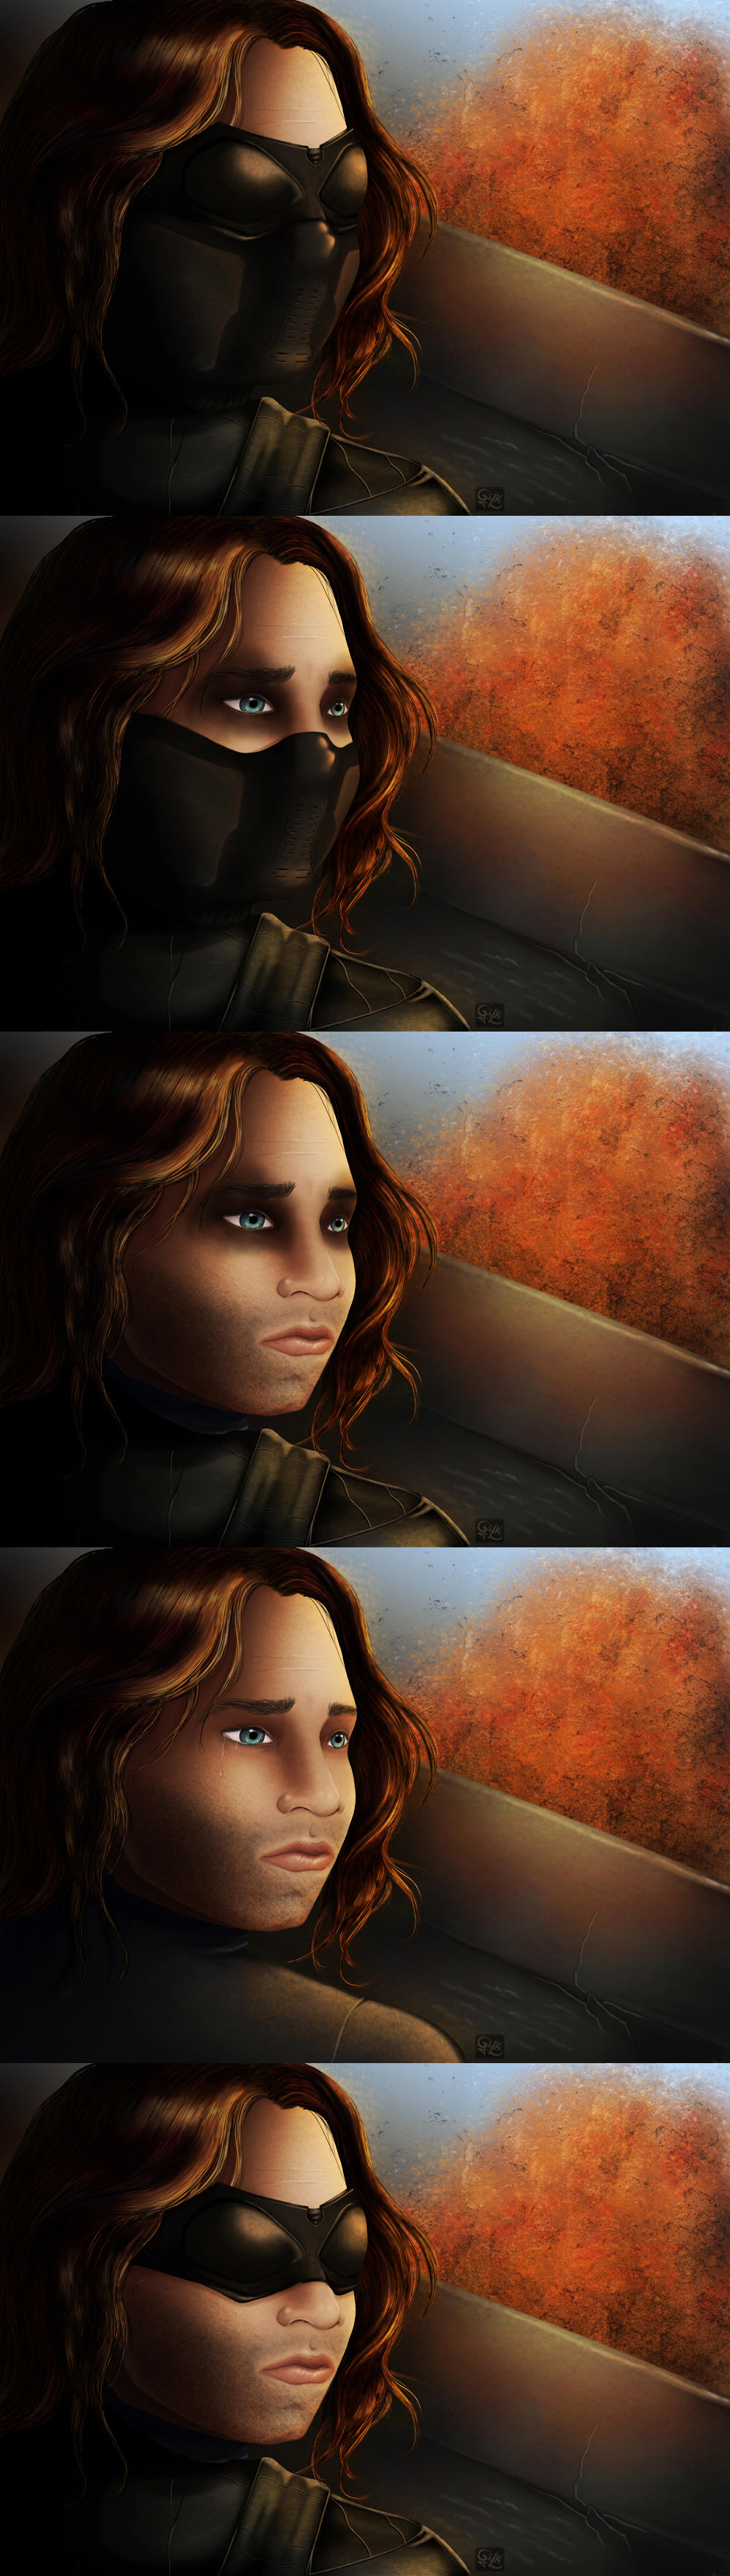 Winter Soldier studies by Caravaggia